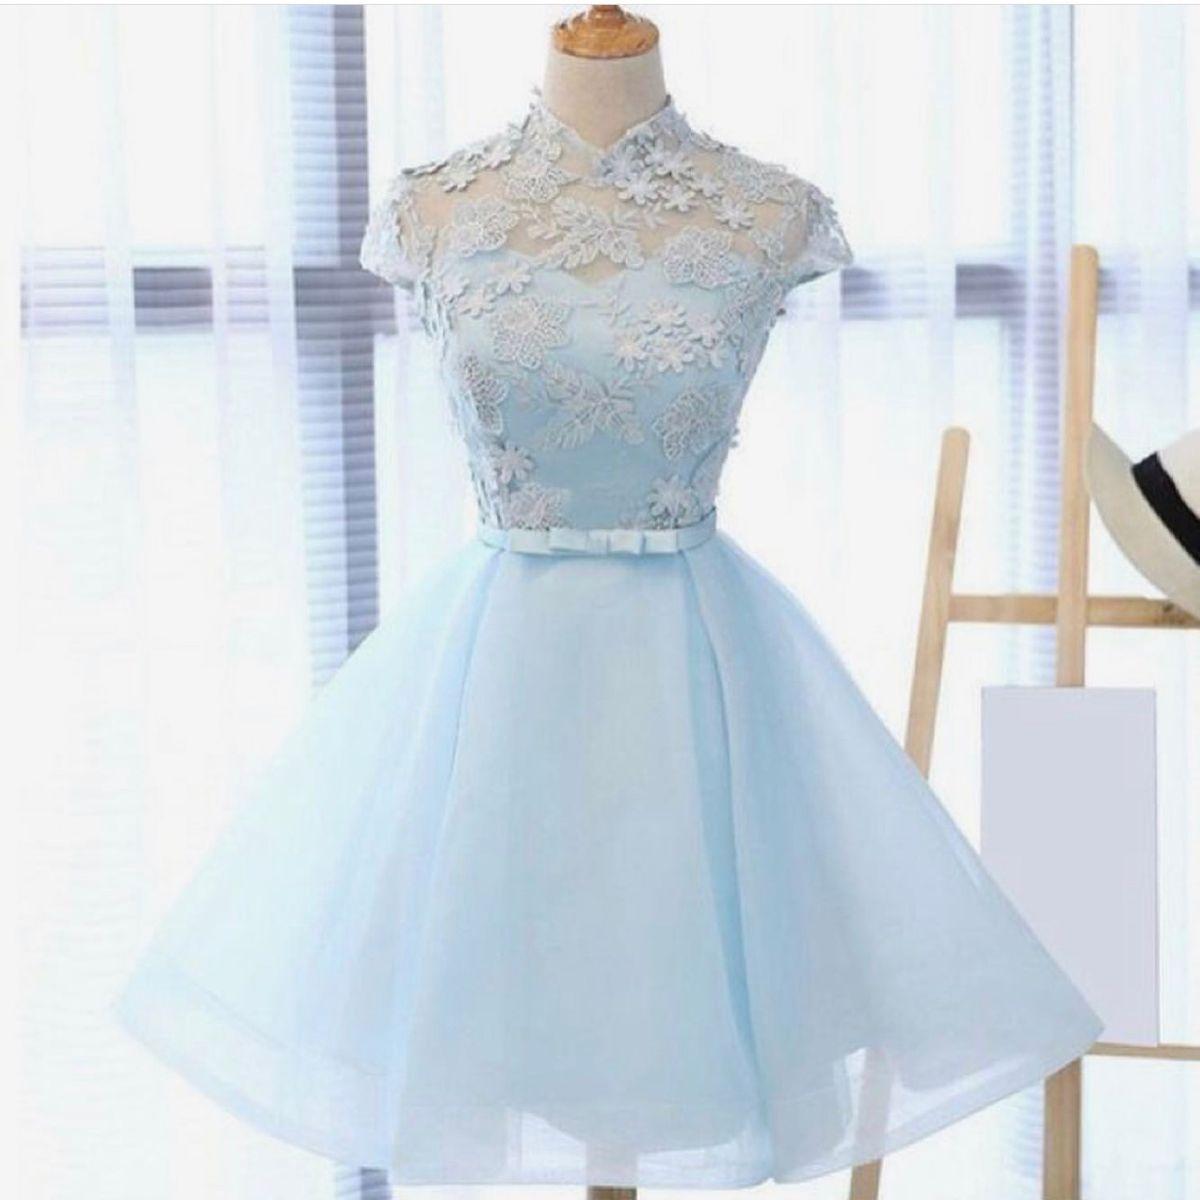 Pin By Ruby Stella Cortez On F A S H I O N Sweet 16 Dresses Sweet 16 Dresses Short Prom Dresses Short Blue [ 1200 x 1200 Pixel ]